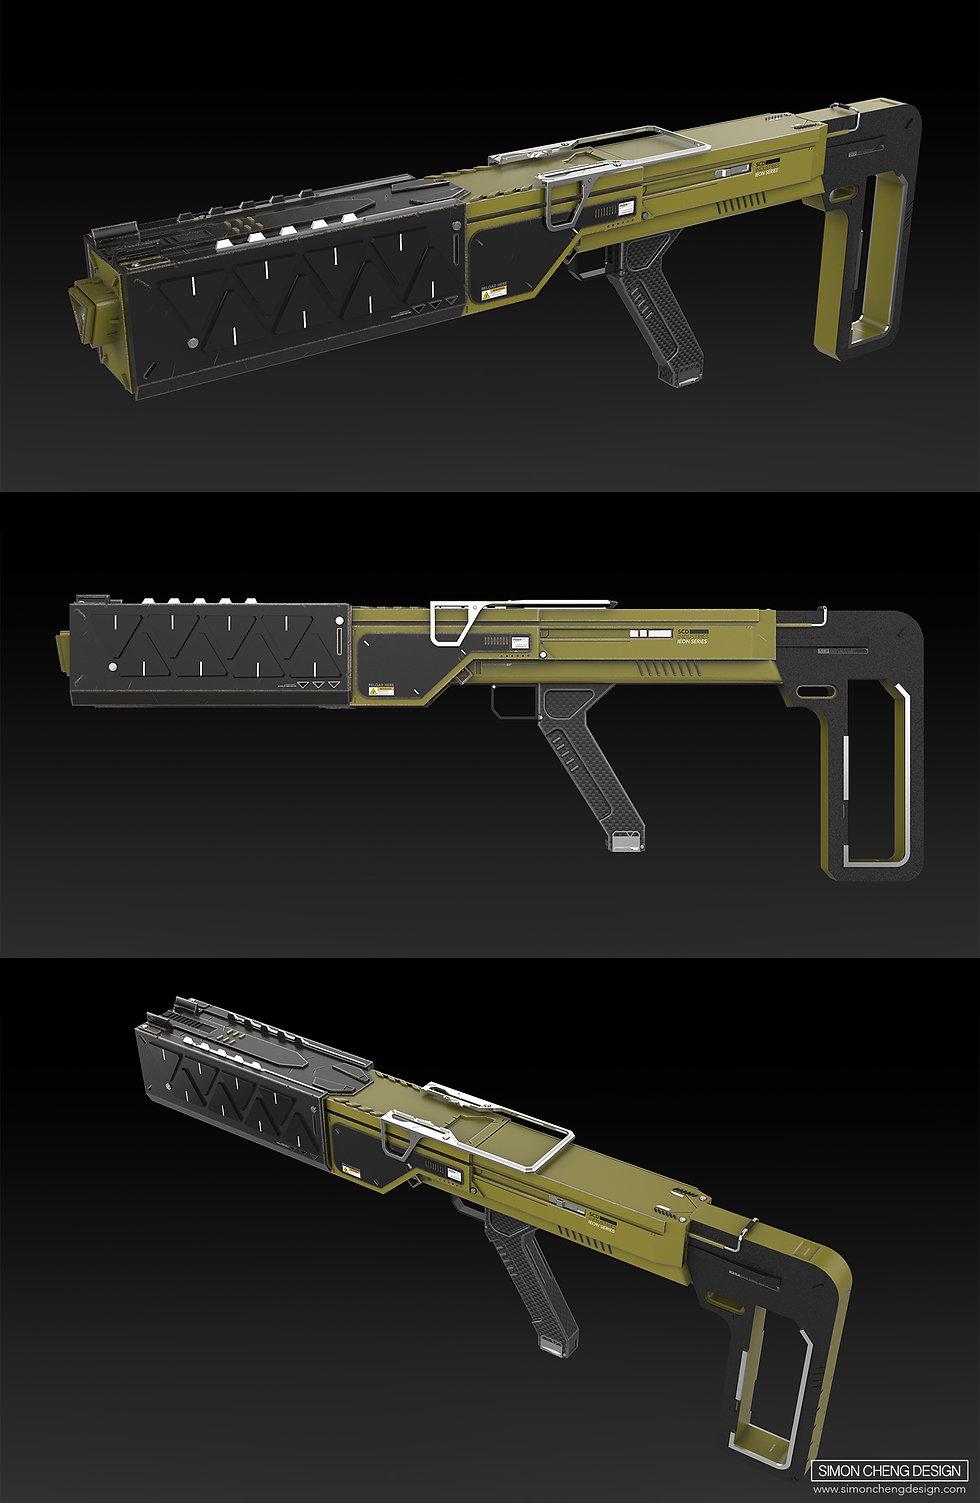 scd_weapon_033.jpg